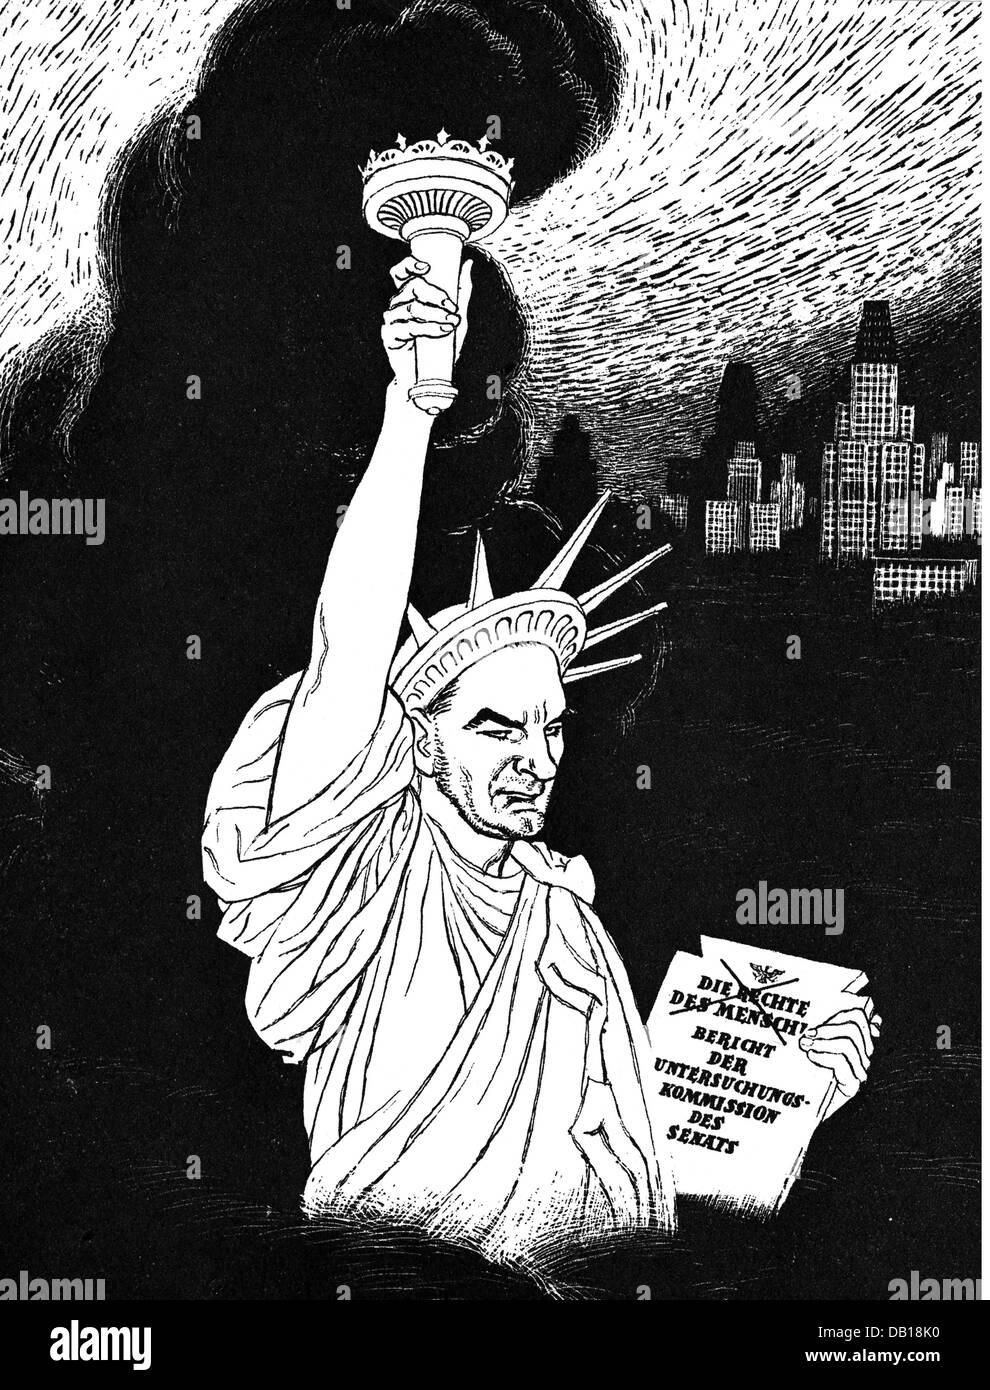 McCarthy, Joseph, 14.11.1908 - 2.5.1957, American politician, 'McCarthy replacing the statue of liberty', - Stock Image